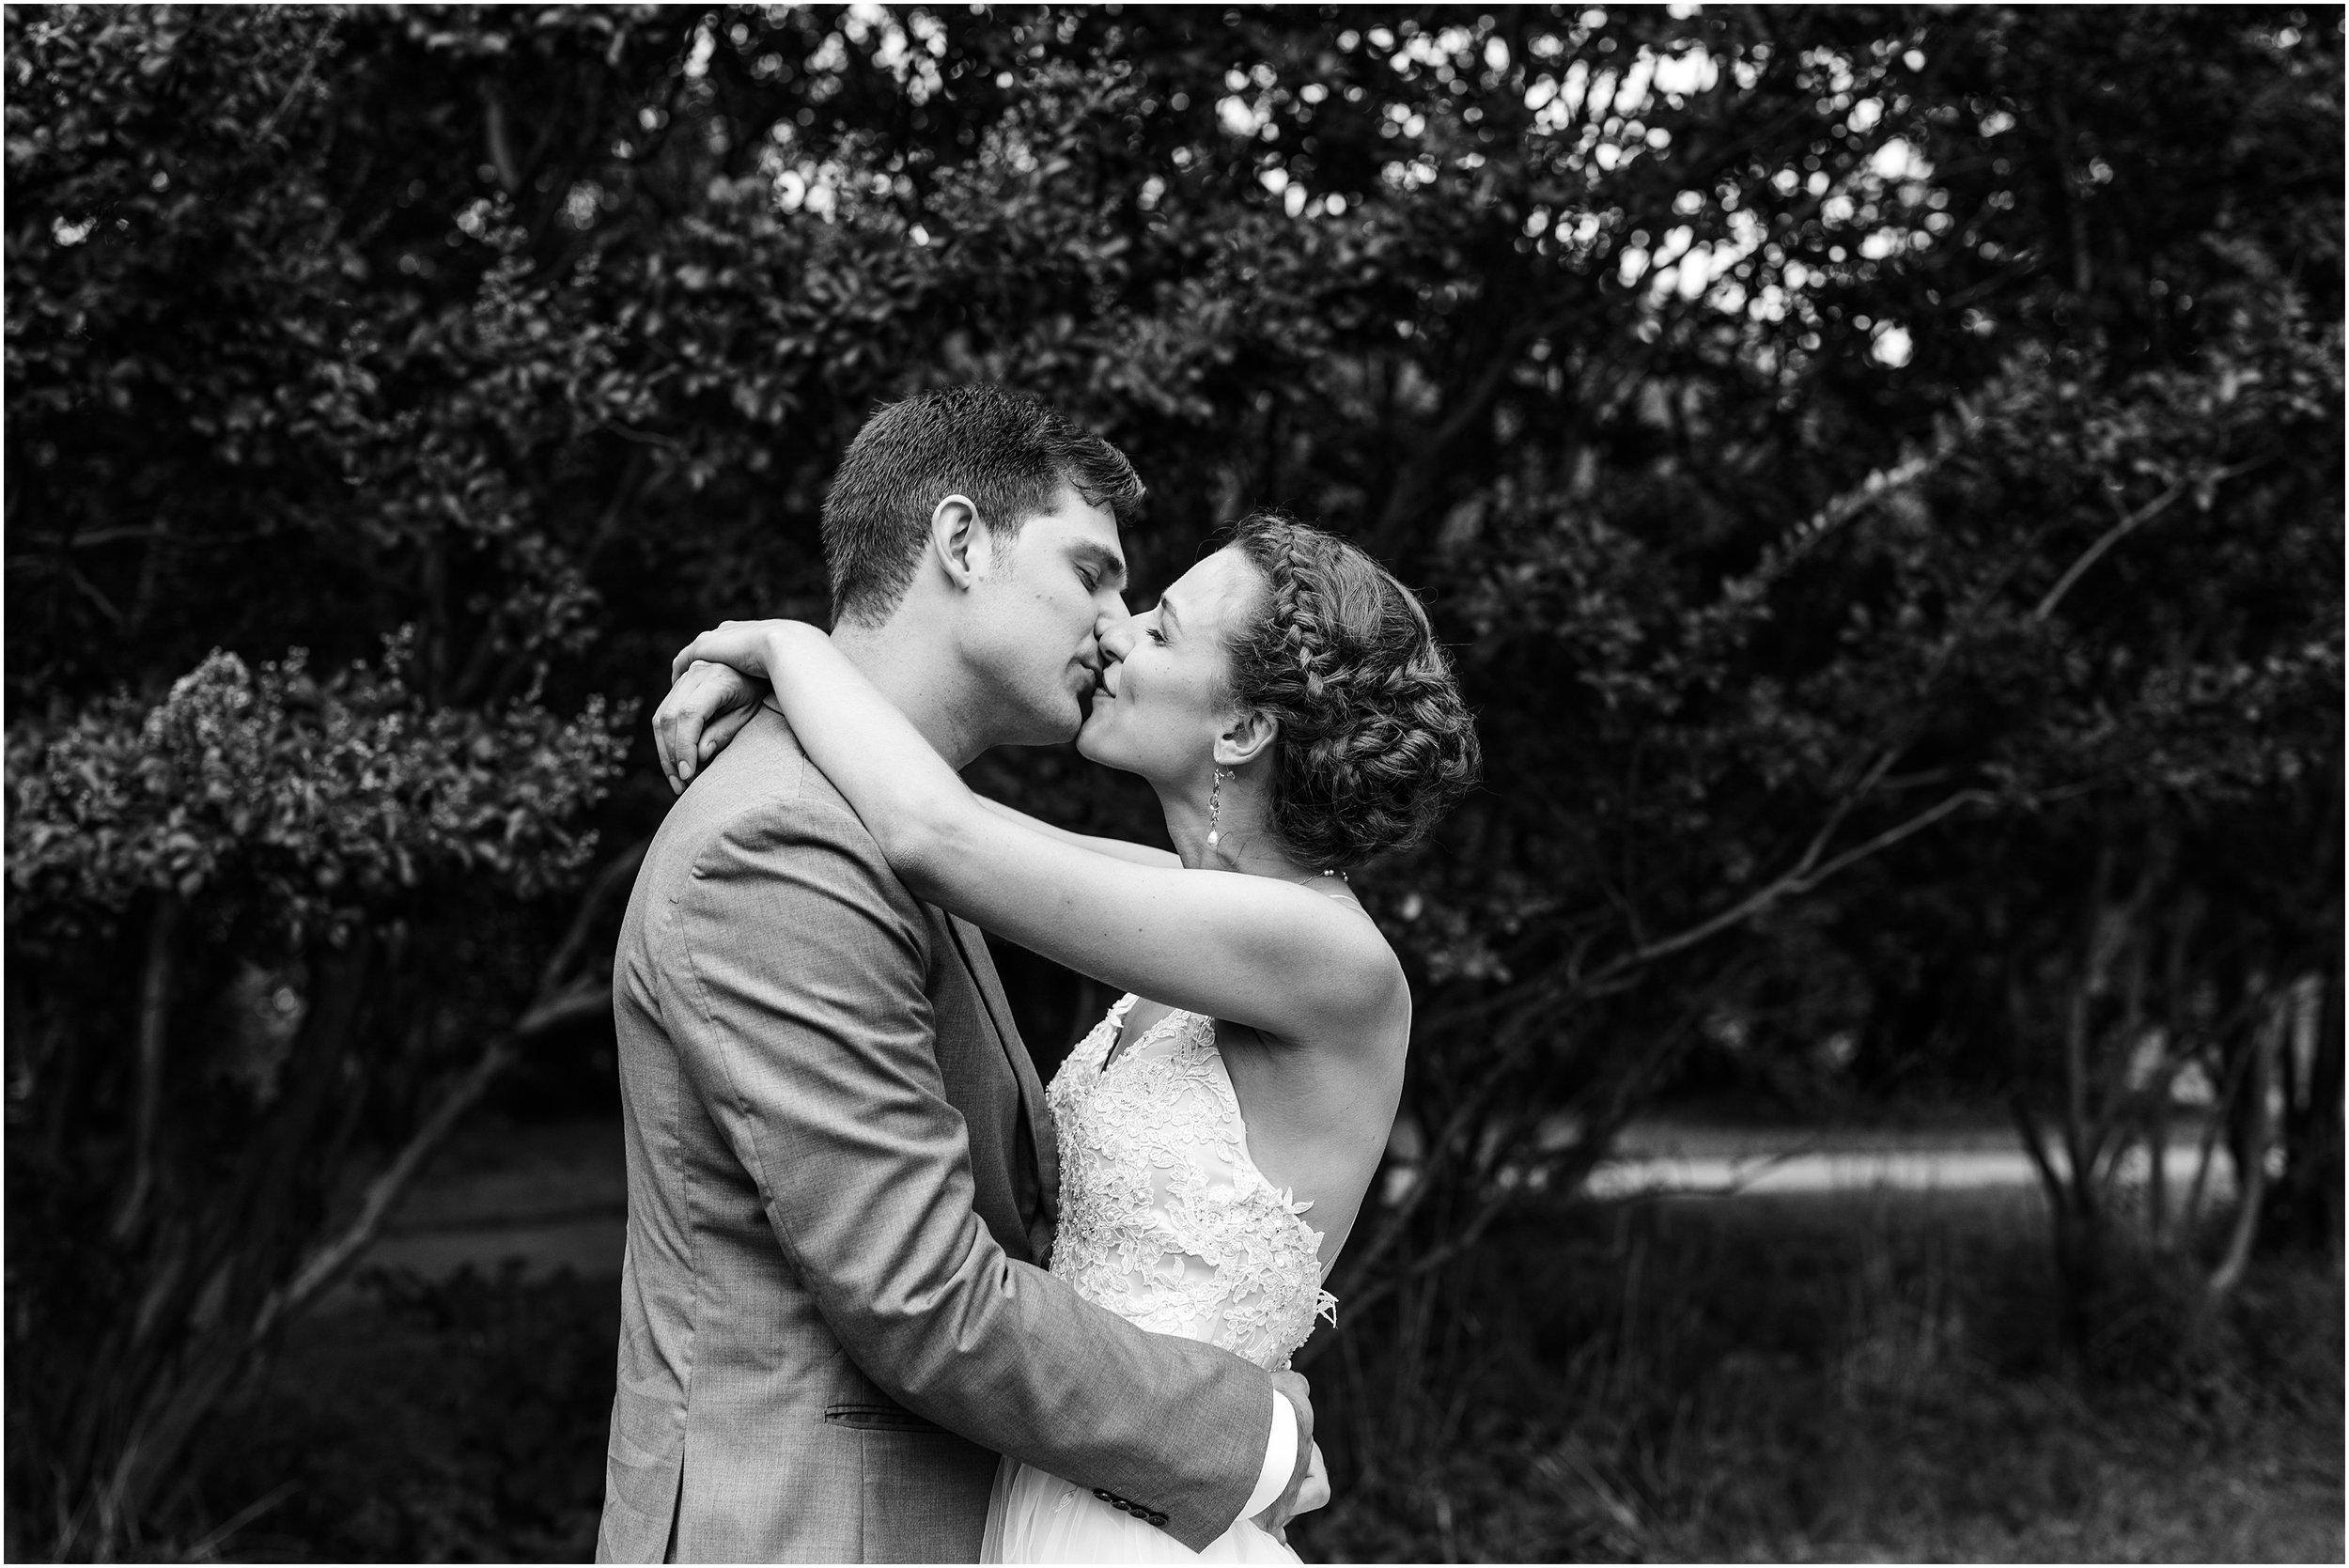 hannah leigh photography Cylburn Arboretum Wedding Baltimore, MD_3412.jpg